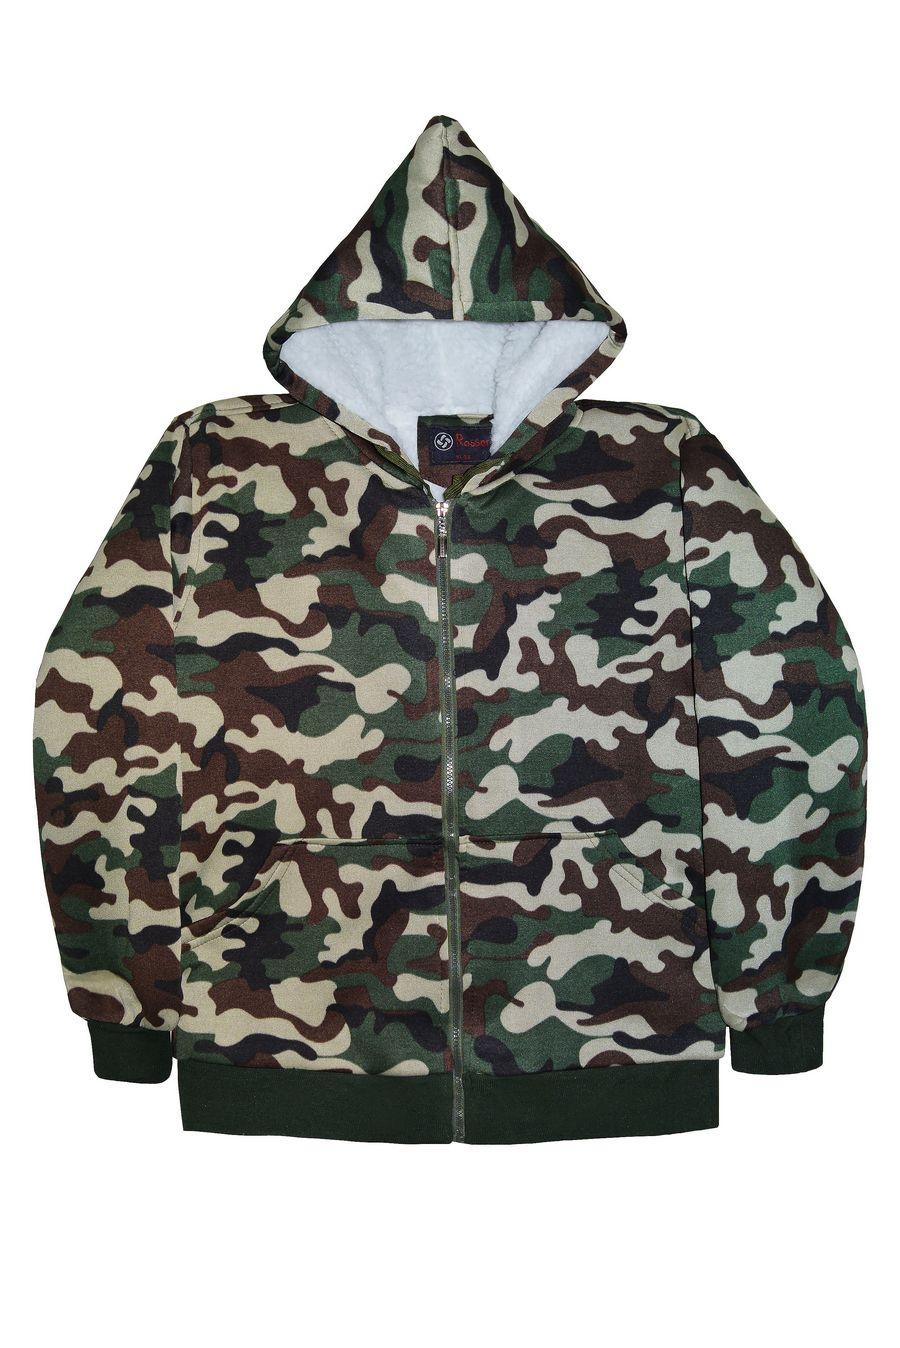 Куртка мужская Rosser 01 светлая камуфляж утепленная - фото 1